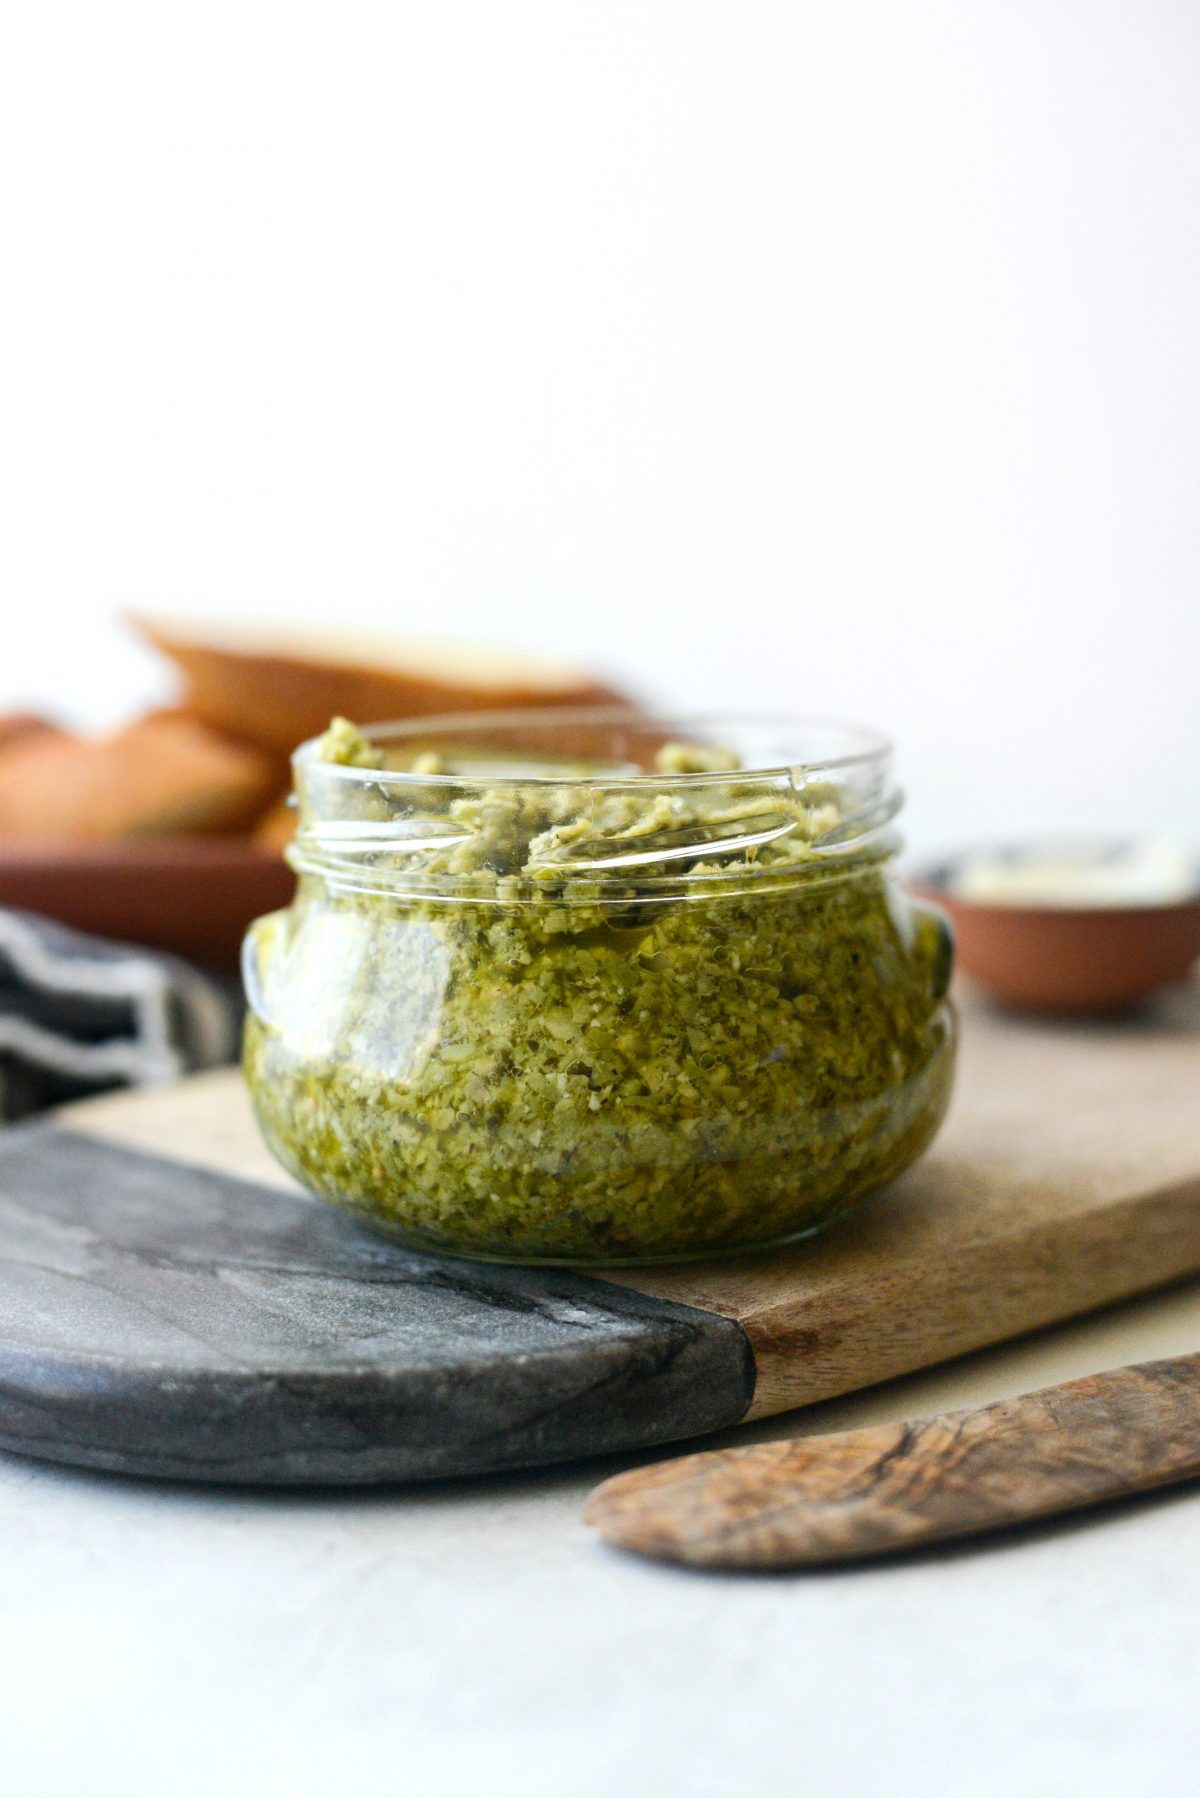 Castelvetrano Olive Tapenade l SimplyScratch.com #olives #tapenade #appetizer #easy #spread